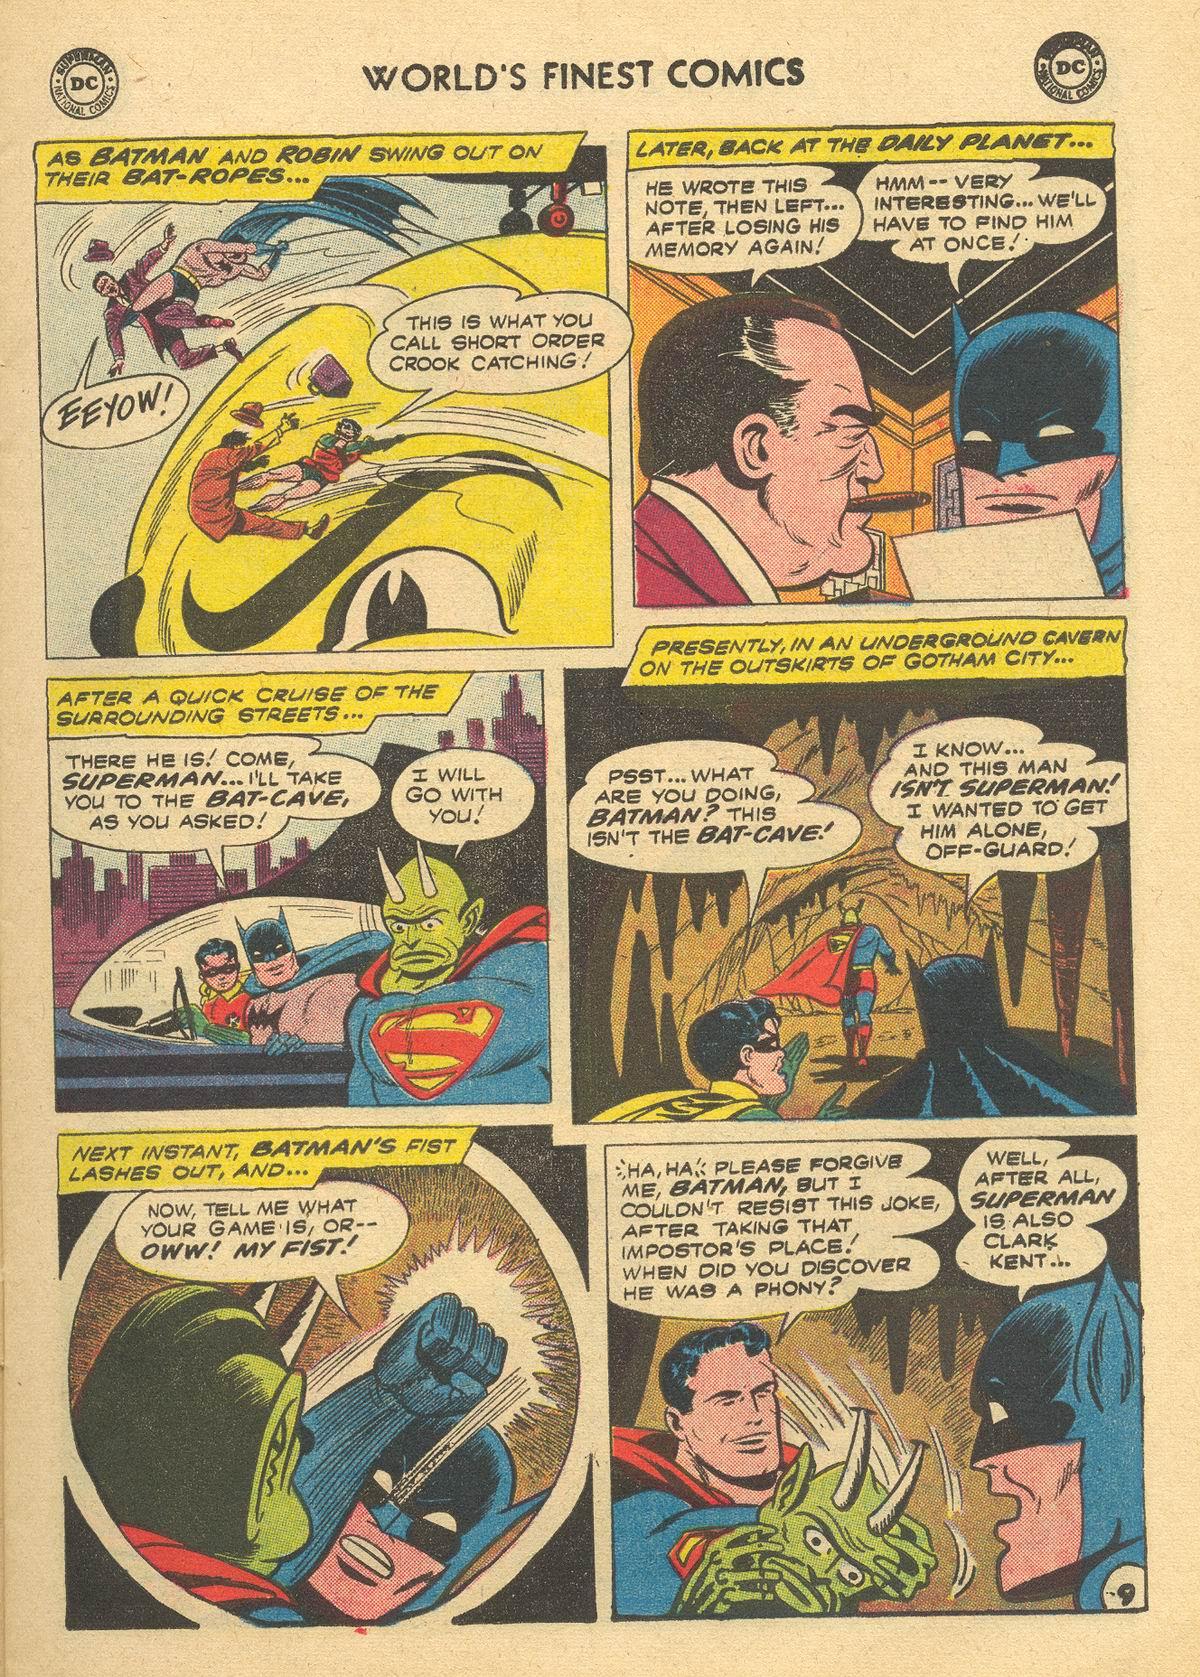 Read online World's Finest Comics comic -  Issue #105 - 11